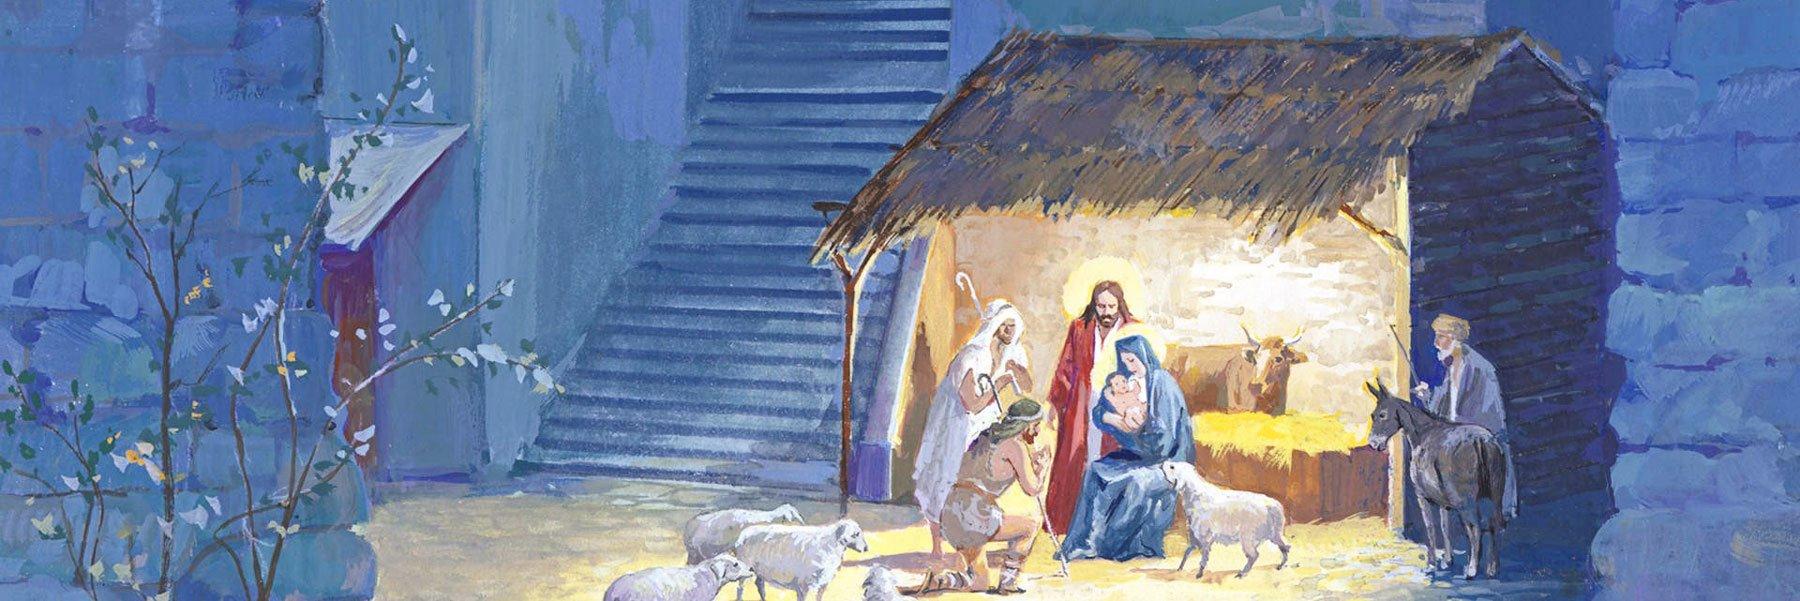 josephs-christmas-story